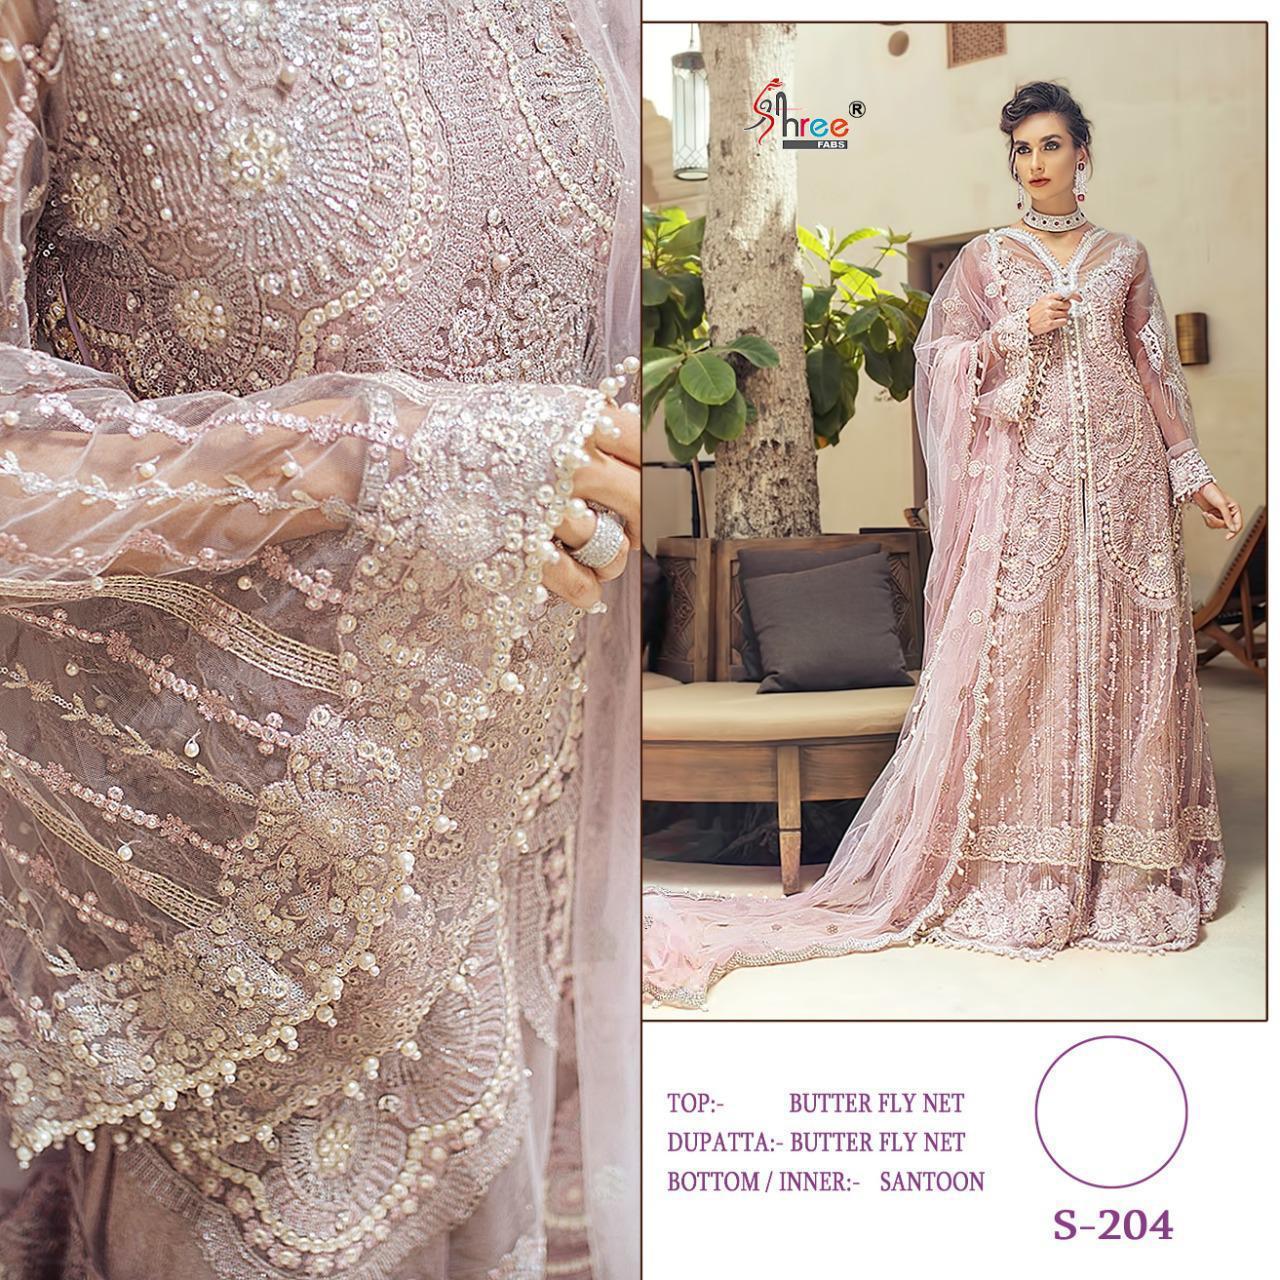 Shree Fabs Mushq Embroidered Collection Vol 2 Salwar Suit Wholesale Catalog 4 Pcs 5 - Shree Fabs Mushq Embroidered Collection Vol 2 Salwar Suit Wholesale Catalog 4 Pcs